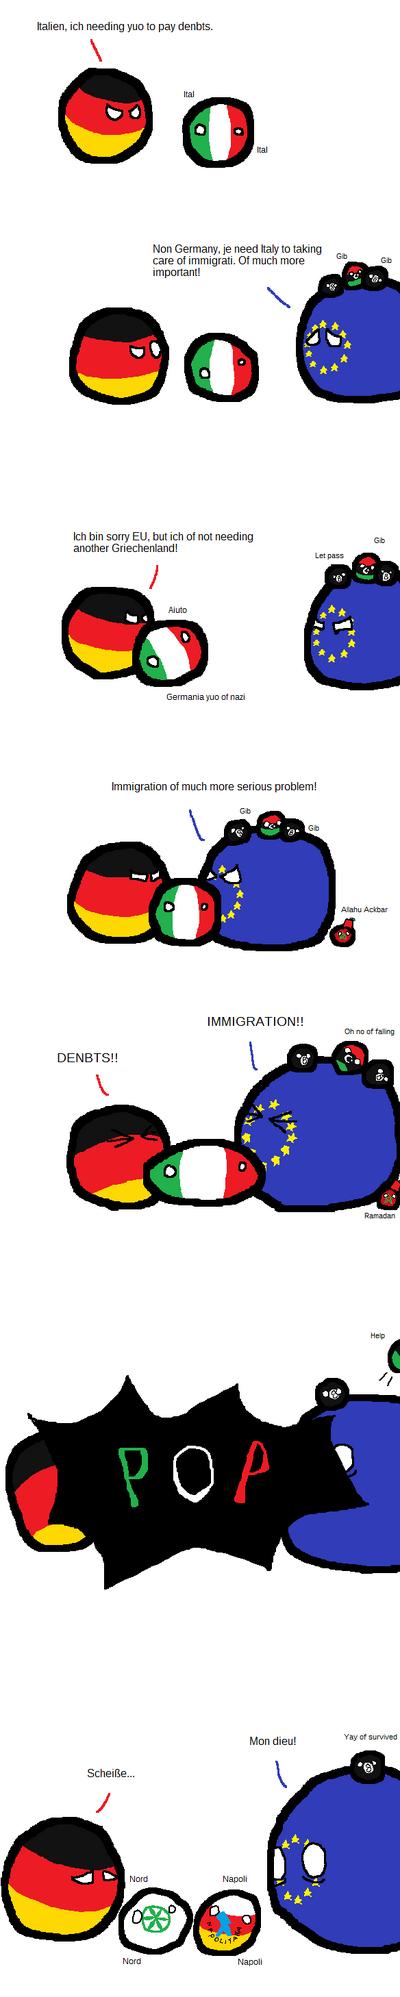 Italy's problems